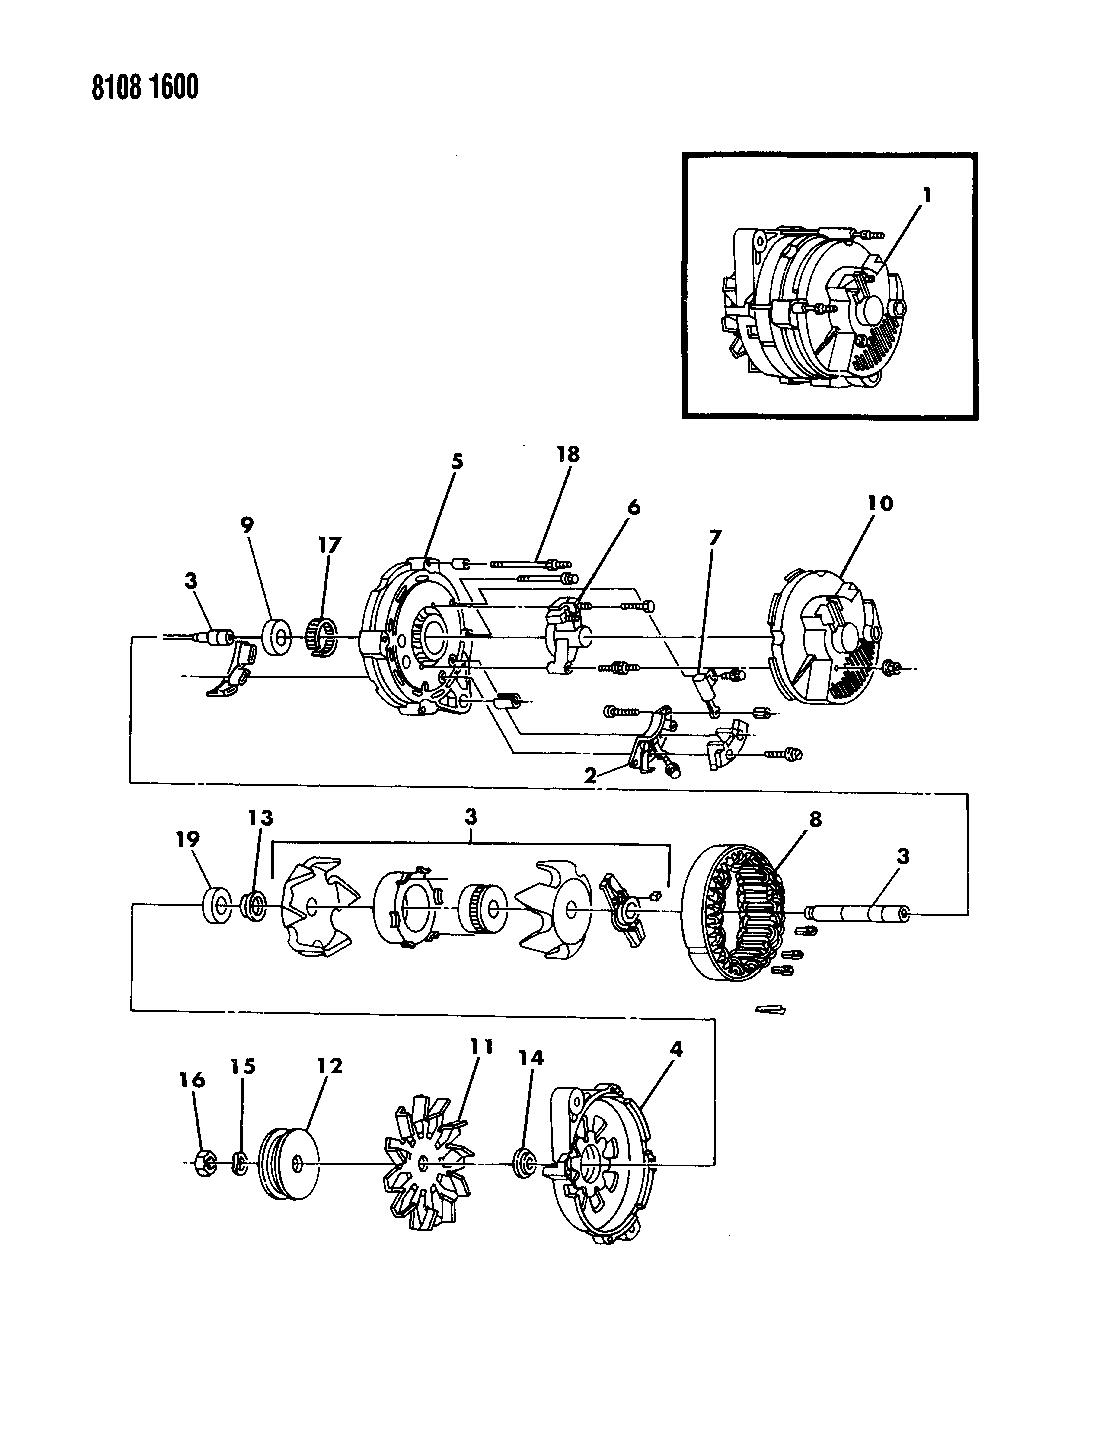 1988 Dodge Grand Caravan Alternator - Mopar Parts Giant on